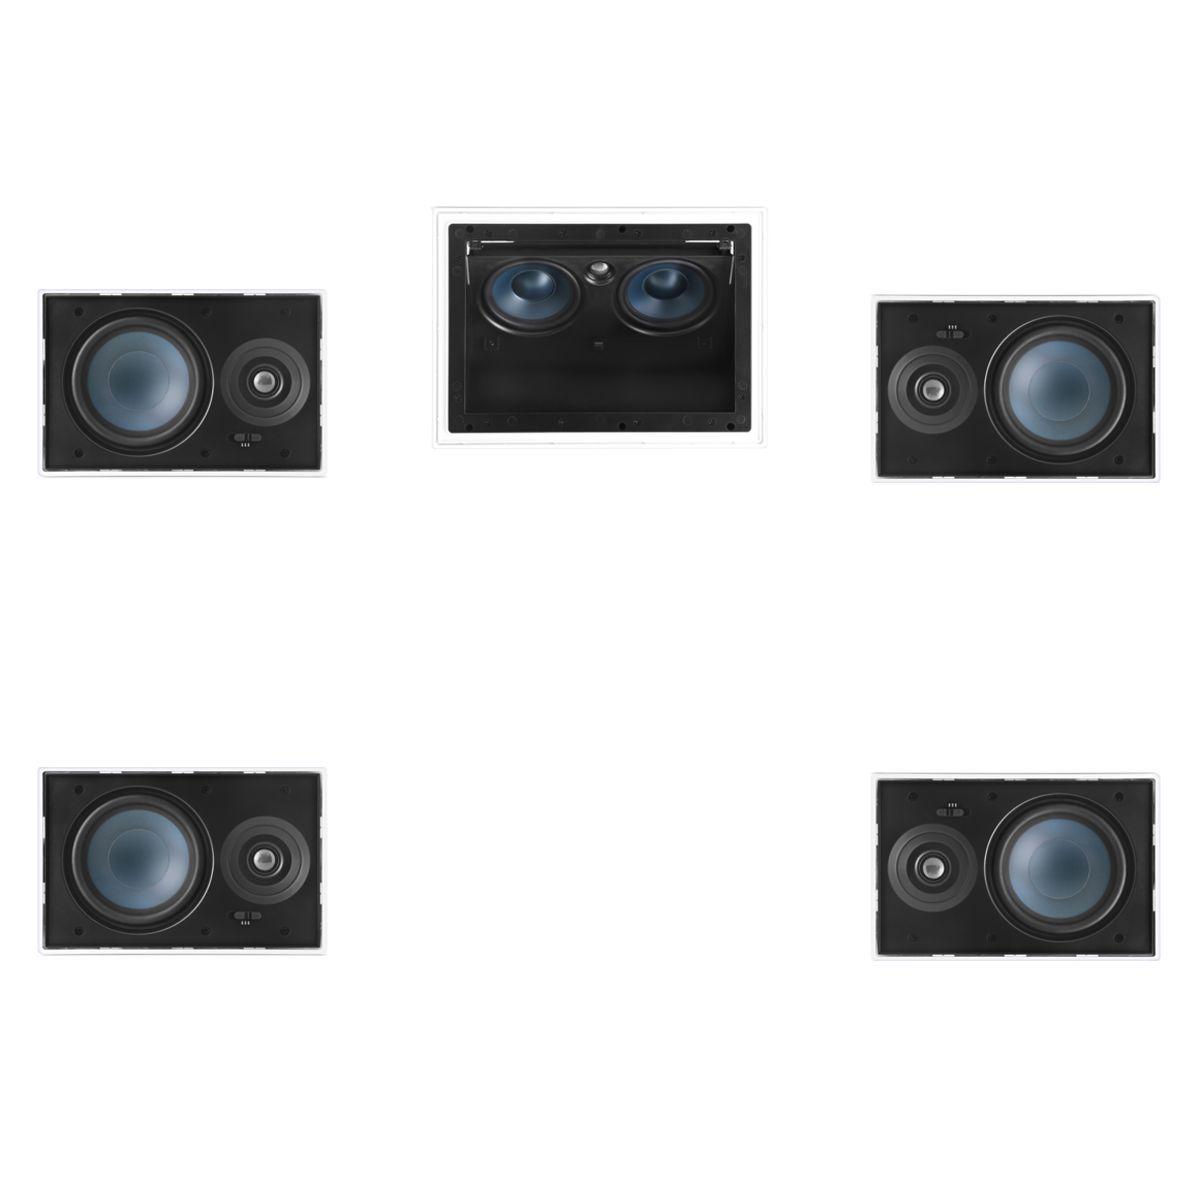 Kit 5.0 Caixa de Embutir no Gesso LCR-A100 + LR-E100 - AAT